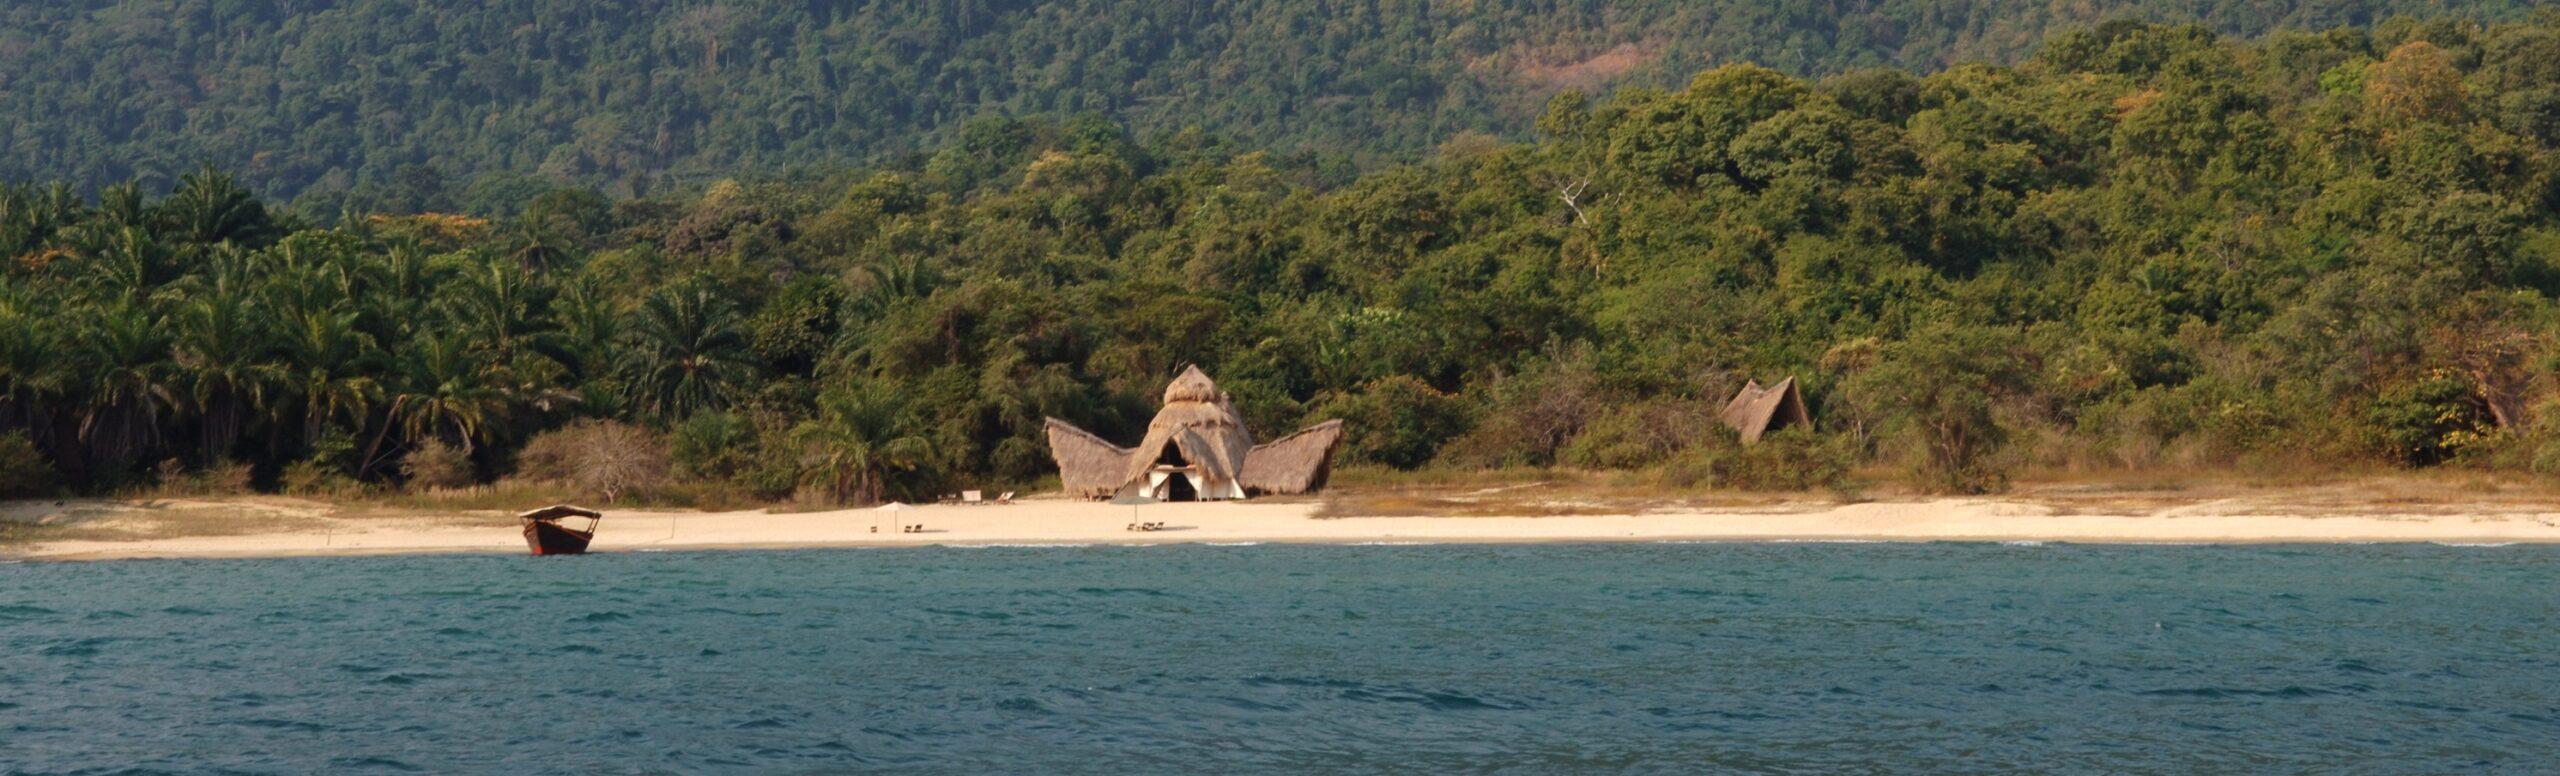 Greystoke Mahale from Lake Tanganyika